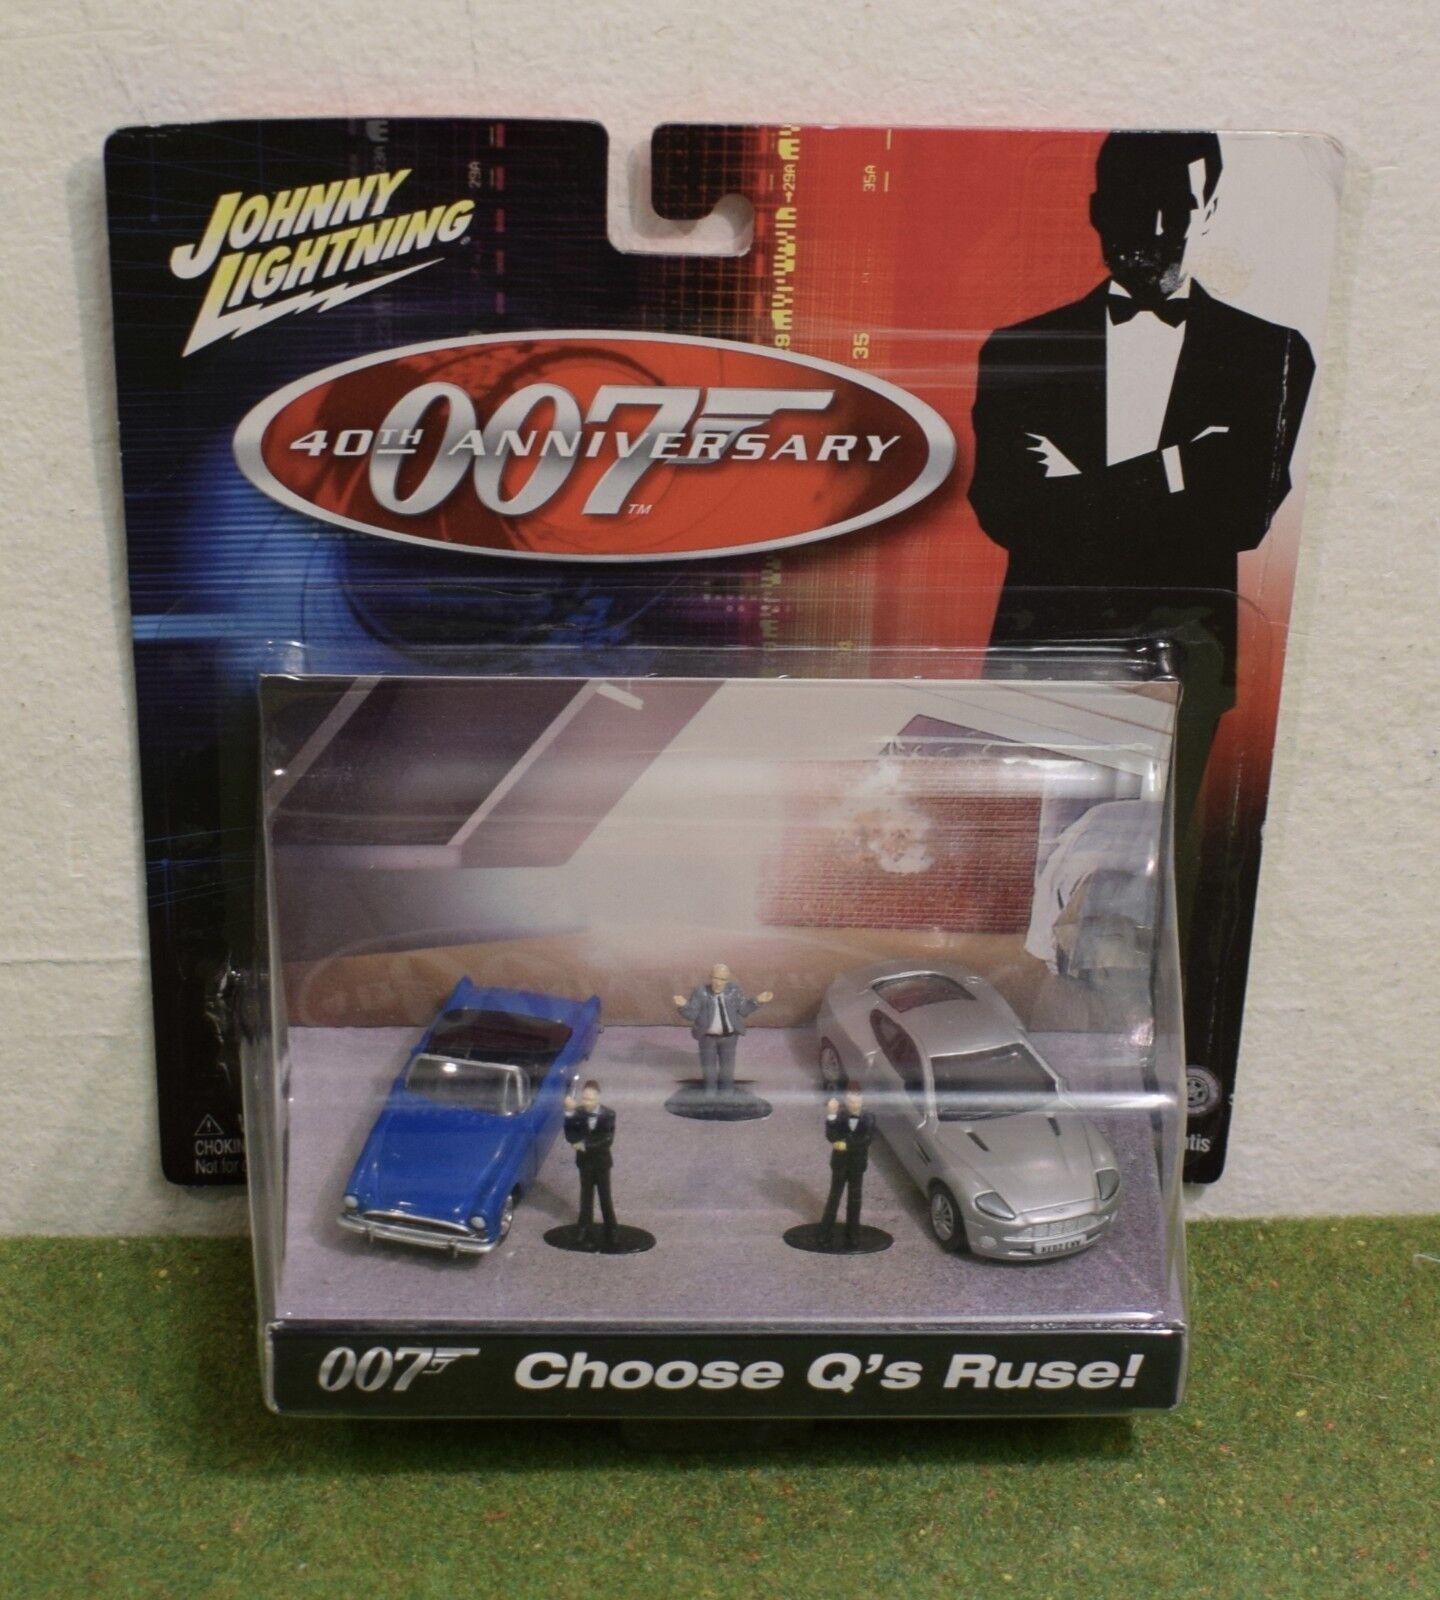 JOHNNY LIGHTNING JAMES BOND 007 40th ANNIVERSARY CHOOSE CHOOSE CHOOSE Q's RUSE 9322c9